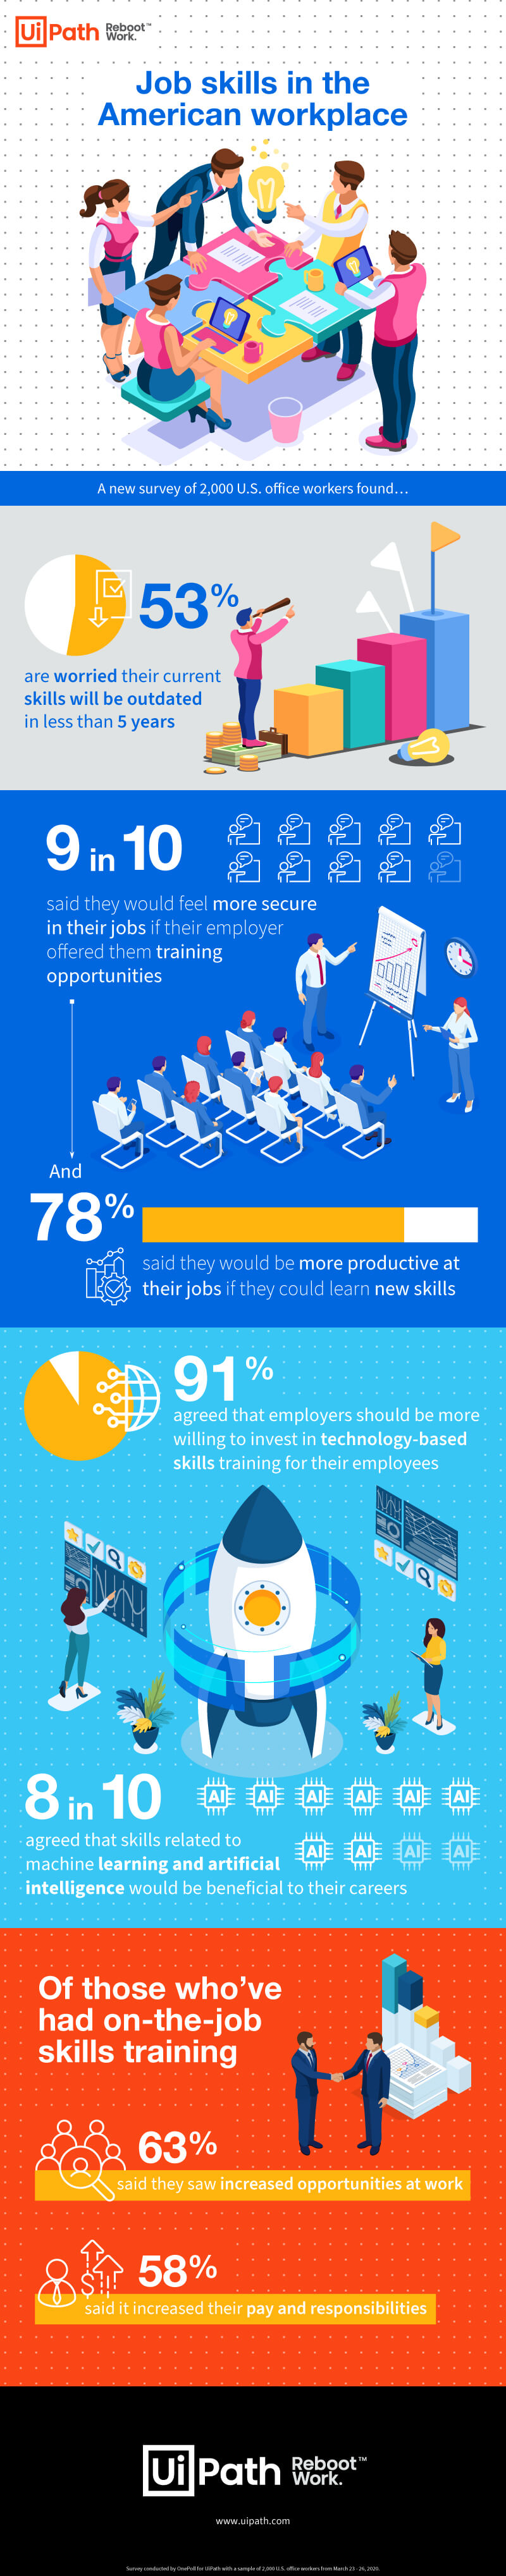 uipath-workforce-survey-skills-gap-may-2020